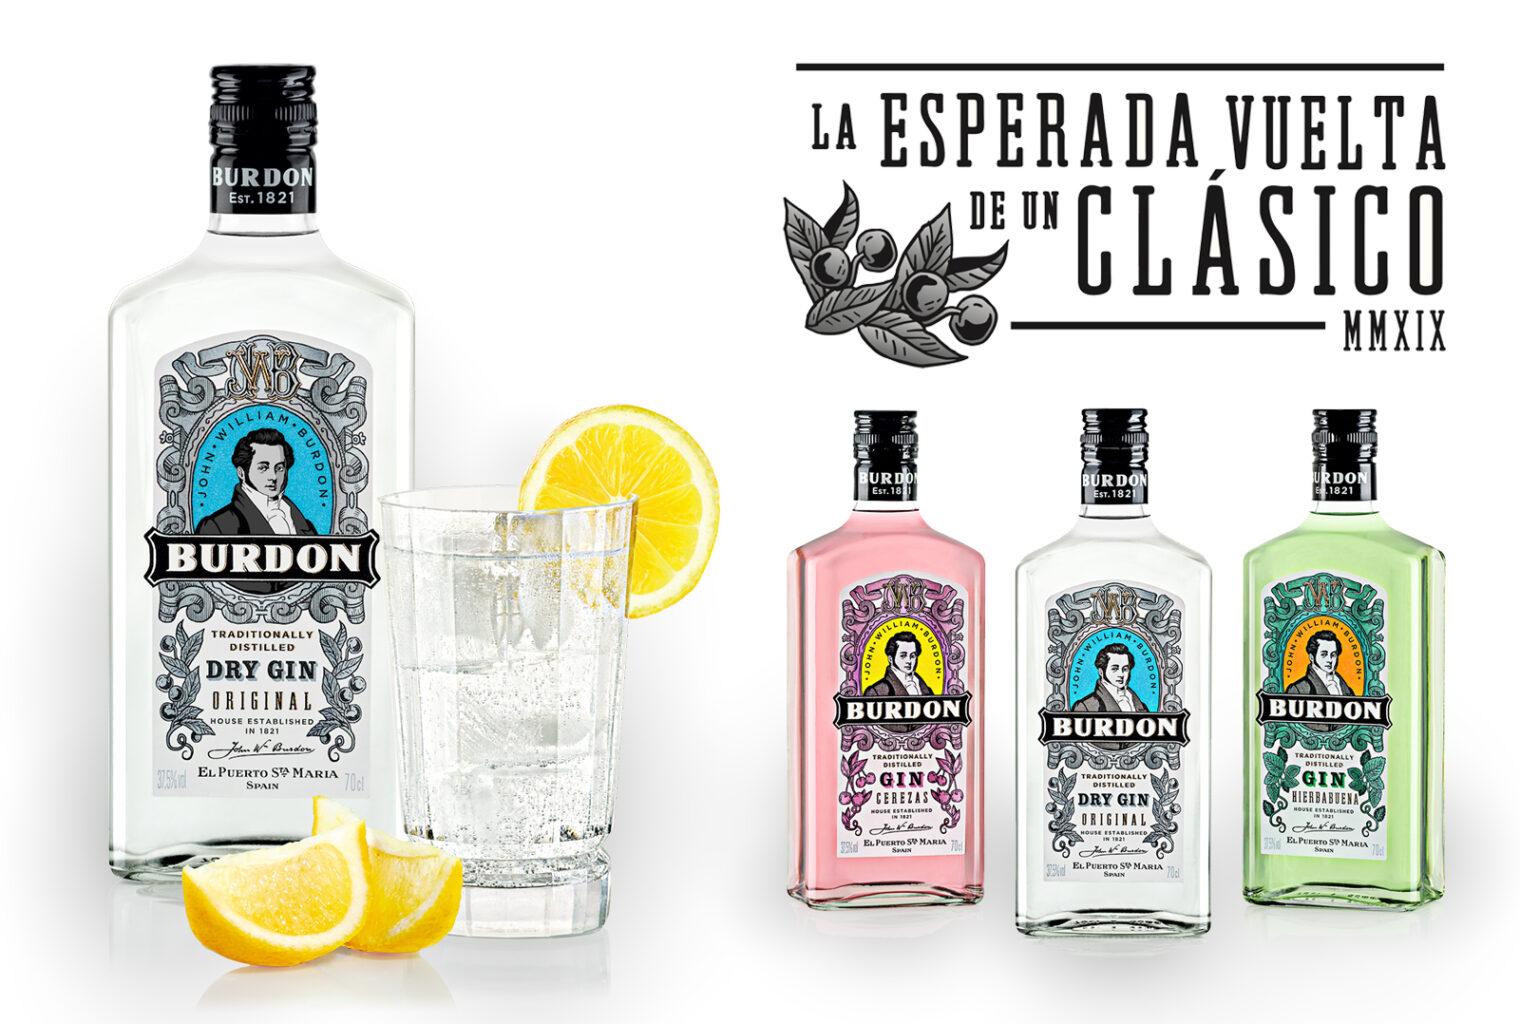 La esperada vuelta de un clásico Burdon Gin